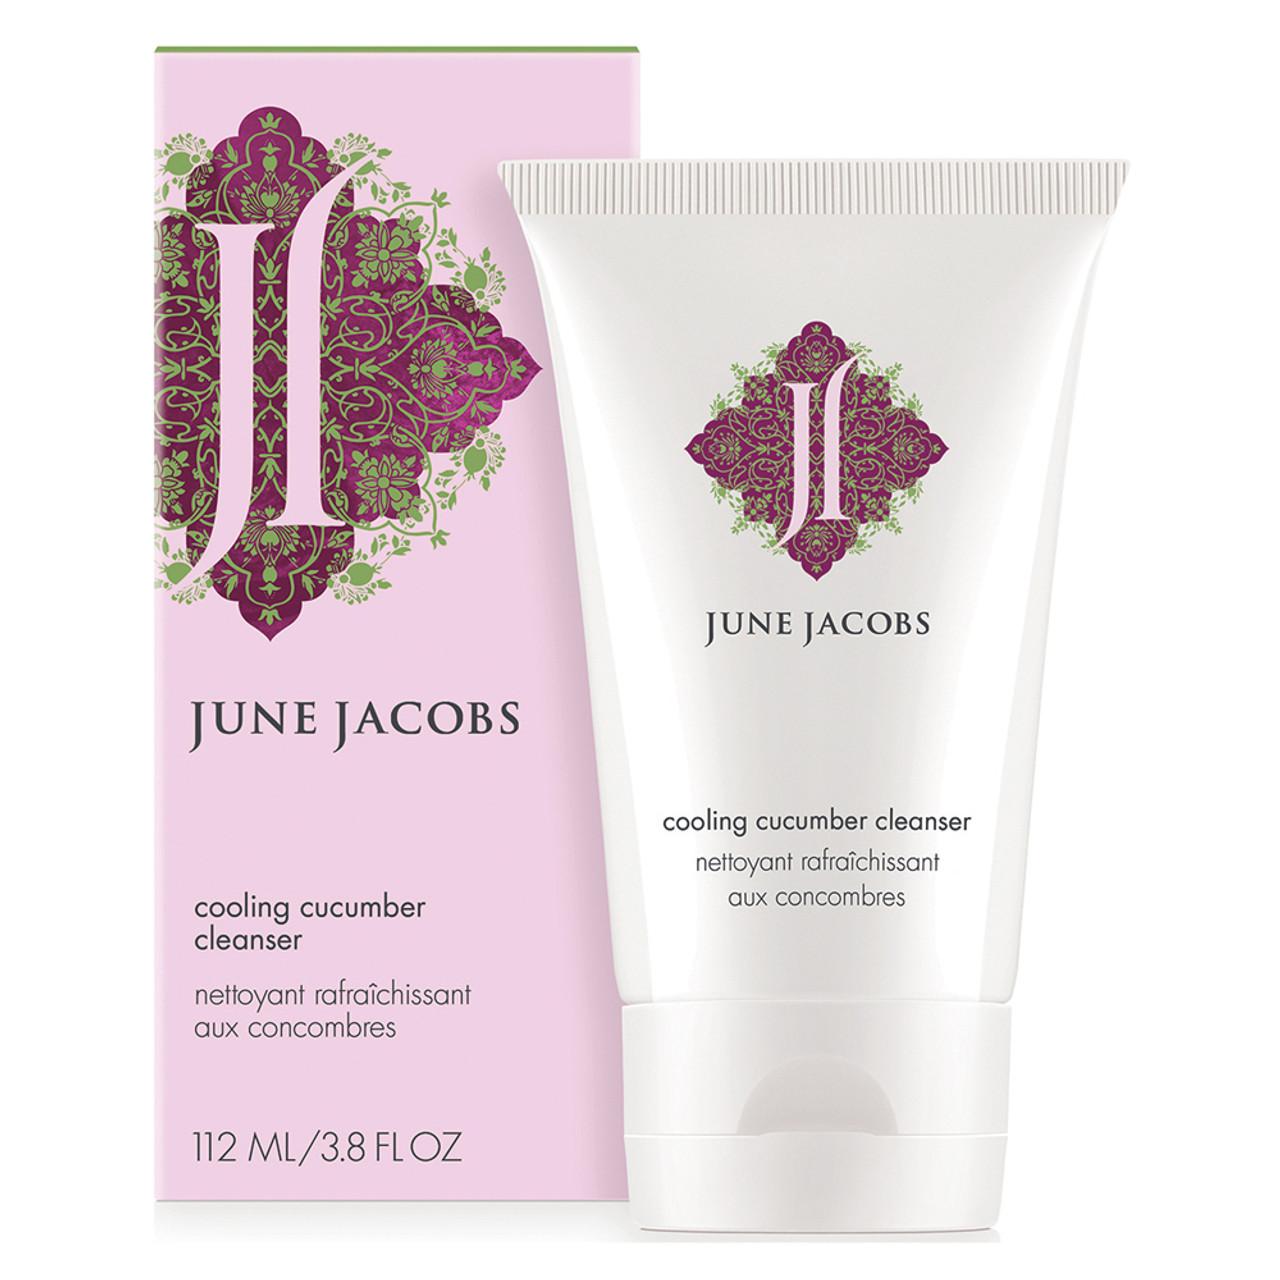 June Jacobs Cooling Cucumber Cleanser BeautifiedYou.com